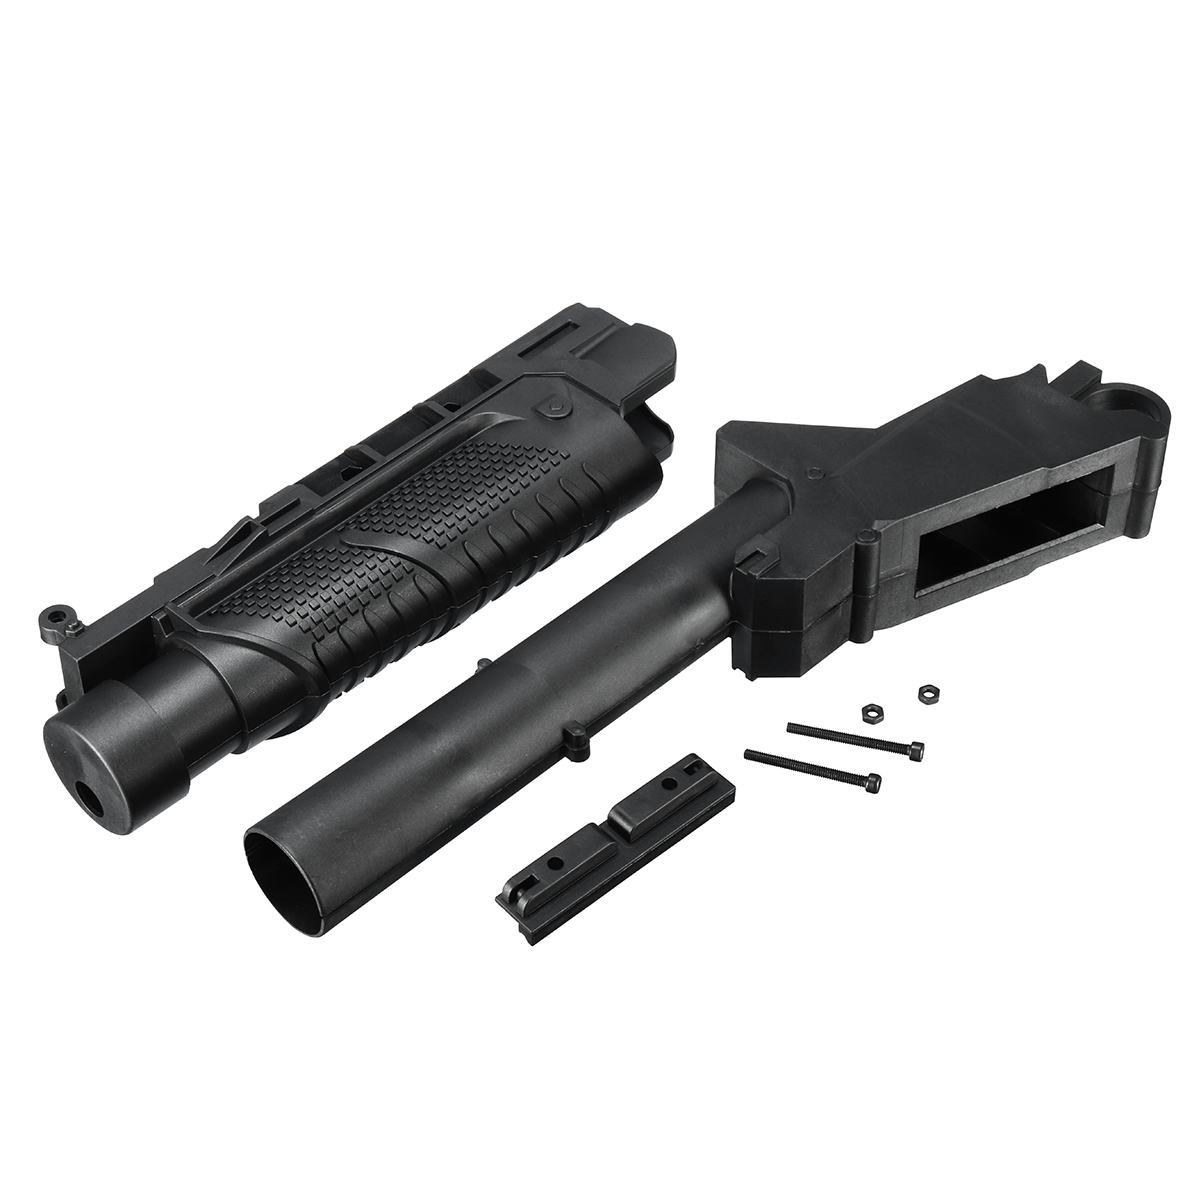 Outdoor Gel Ball Blaster Toy Gun Modified Parts Universal 4x Sight Accessories